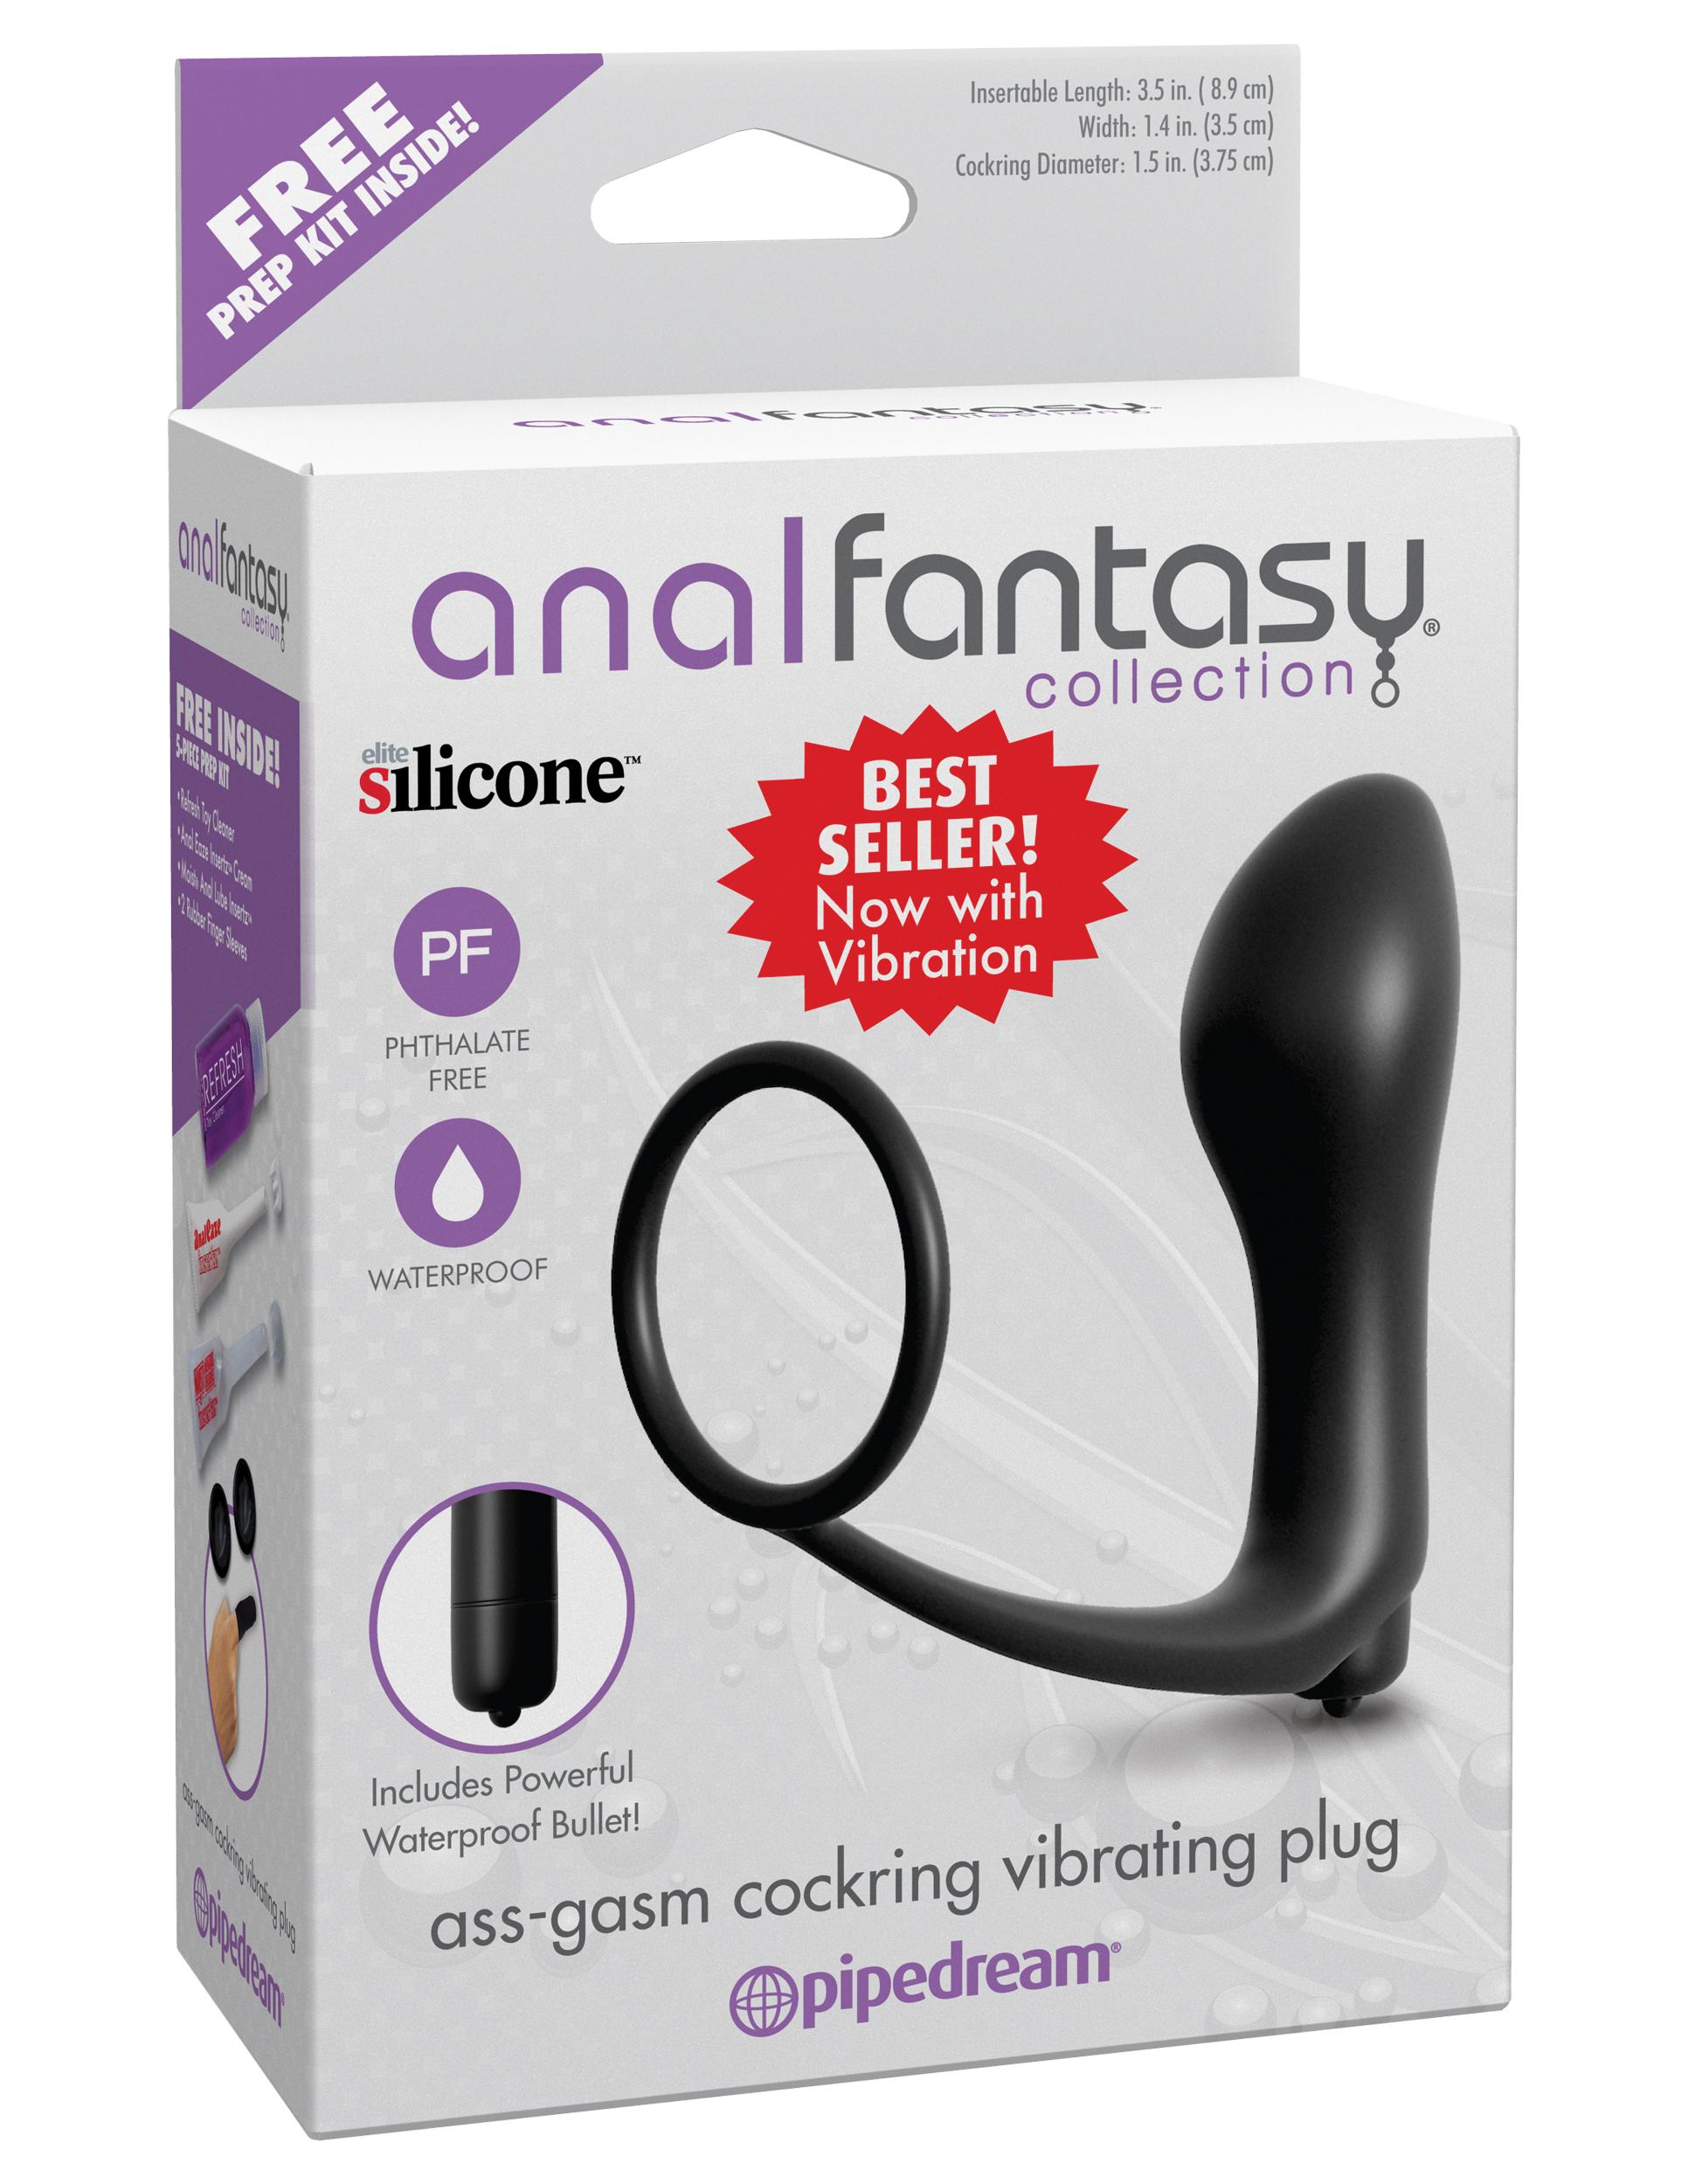 Anal Fantasy Collection Ass-Gasm Cockring Vibrating Plug